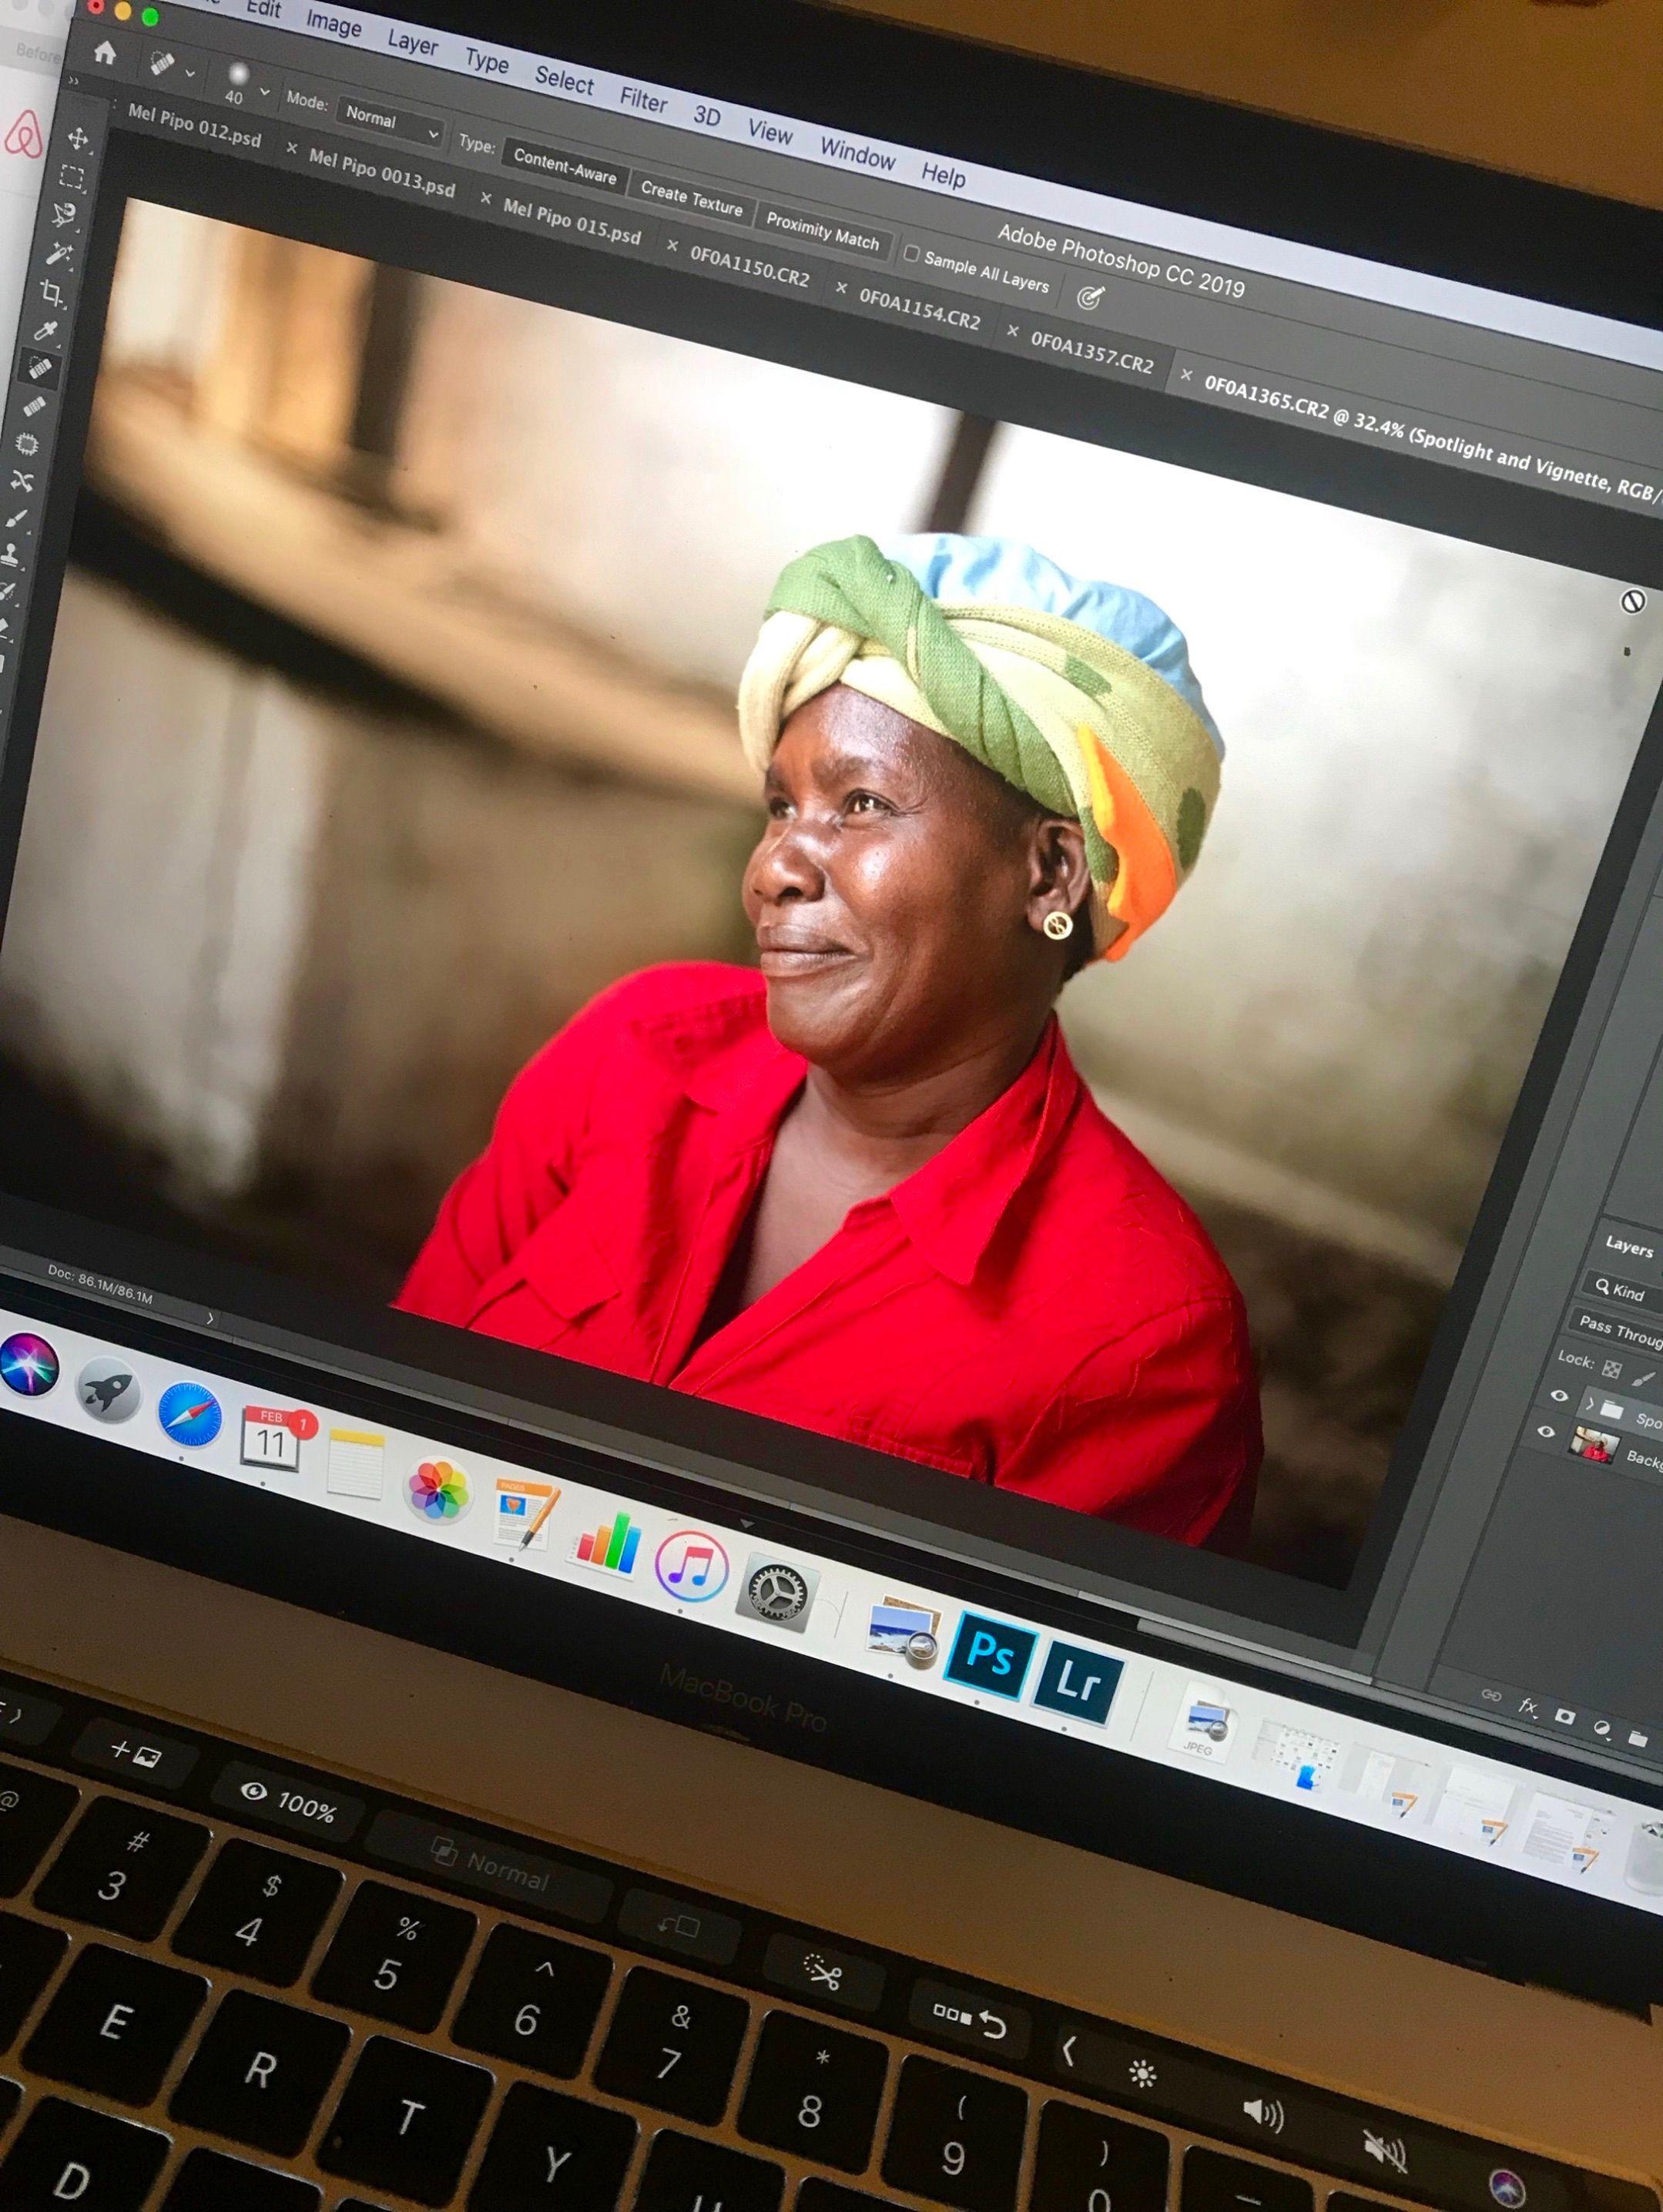 Edits of Jeannine, a school cook from Quartier Morin... her face lights up the sky. ✨ . . #photoedits #behindthescenes #portrait #portraitphotography #artist #creativecommunity #creativeart #creatives #creativeminds #eyephotography #photographer #photographycompany #ayashamedia #mediacompany #haiti #haitianphotography  #PhotographyEveryday #Photogram #JustGoShoot #InstaPhoto #WorldBestGram #PhotographySouls #PhotoOfTheDay #adobeindesign #adobephotoshop